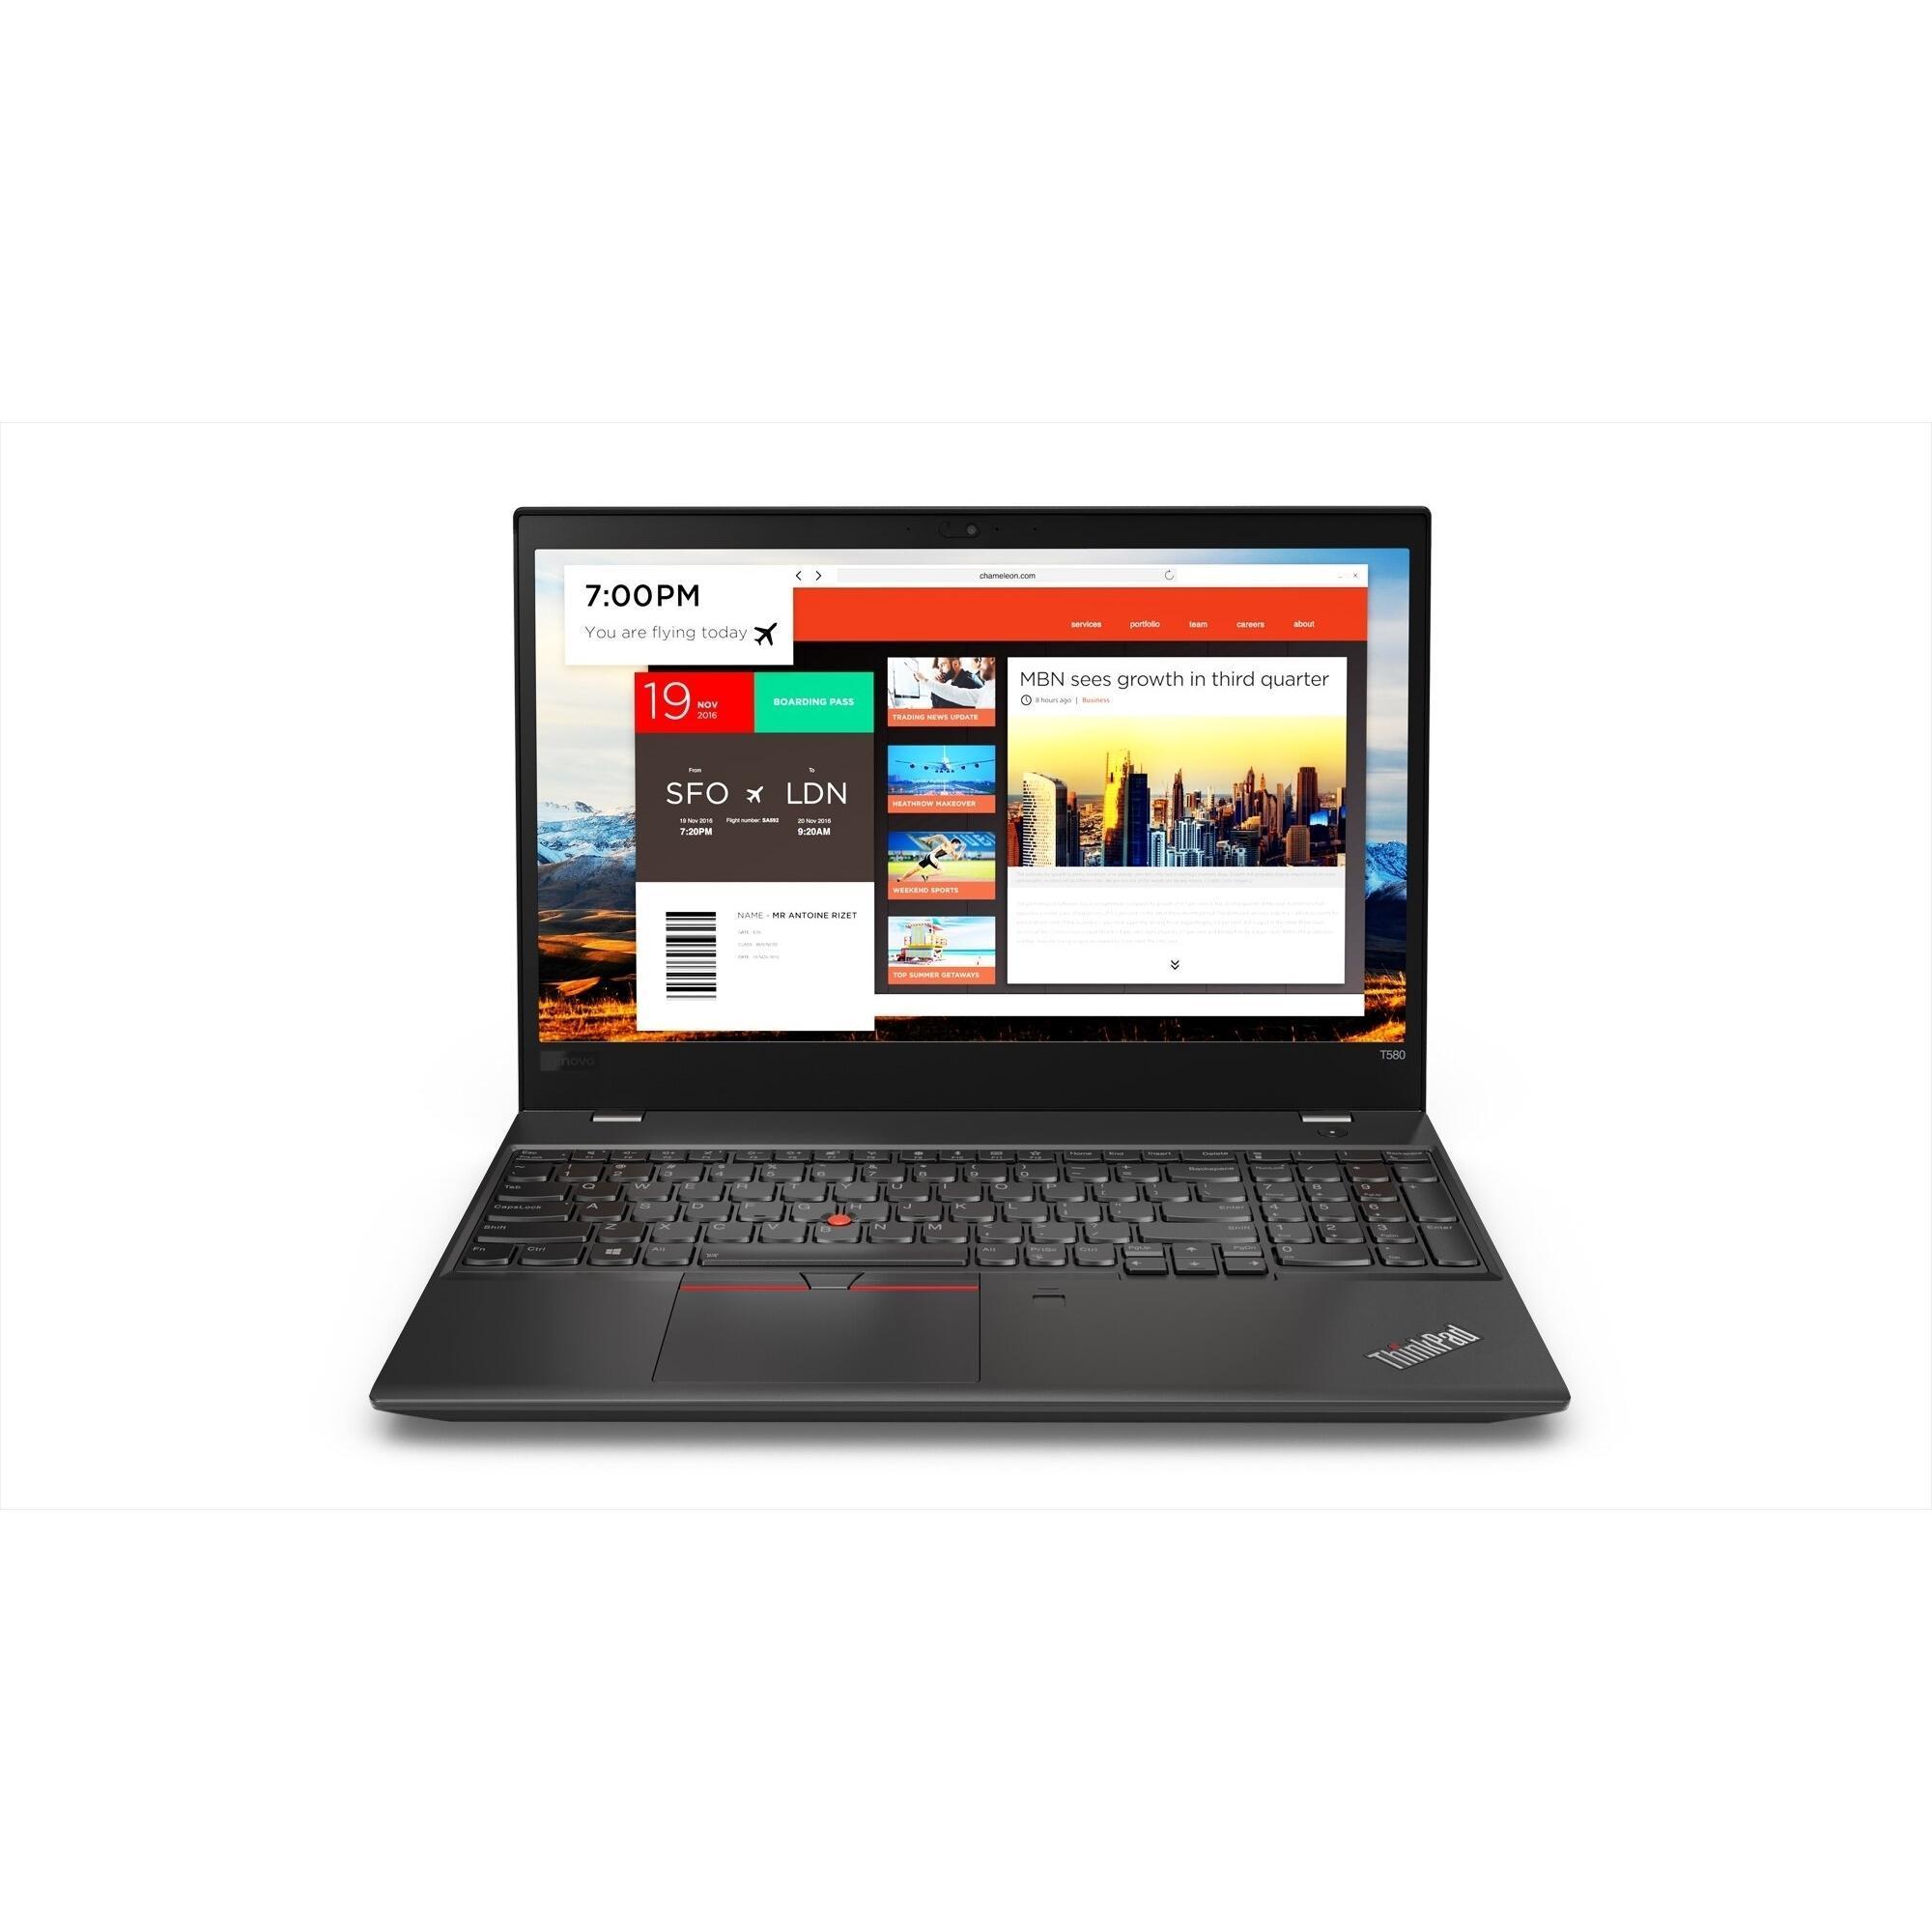 Lenovo ThinkPad T580 15.6-inch (2018) - Core i7-8650U - 32 GB - SSD 1000 GB